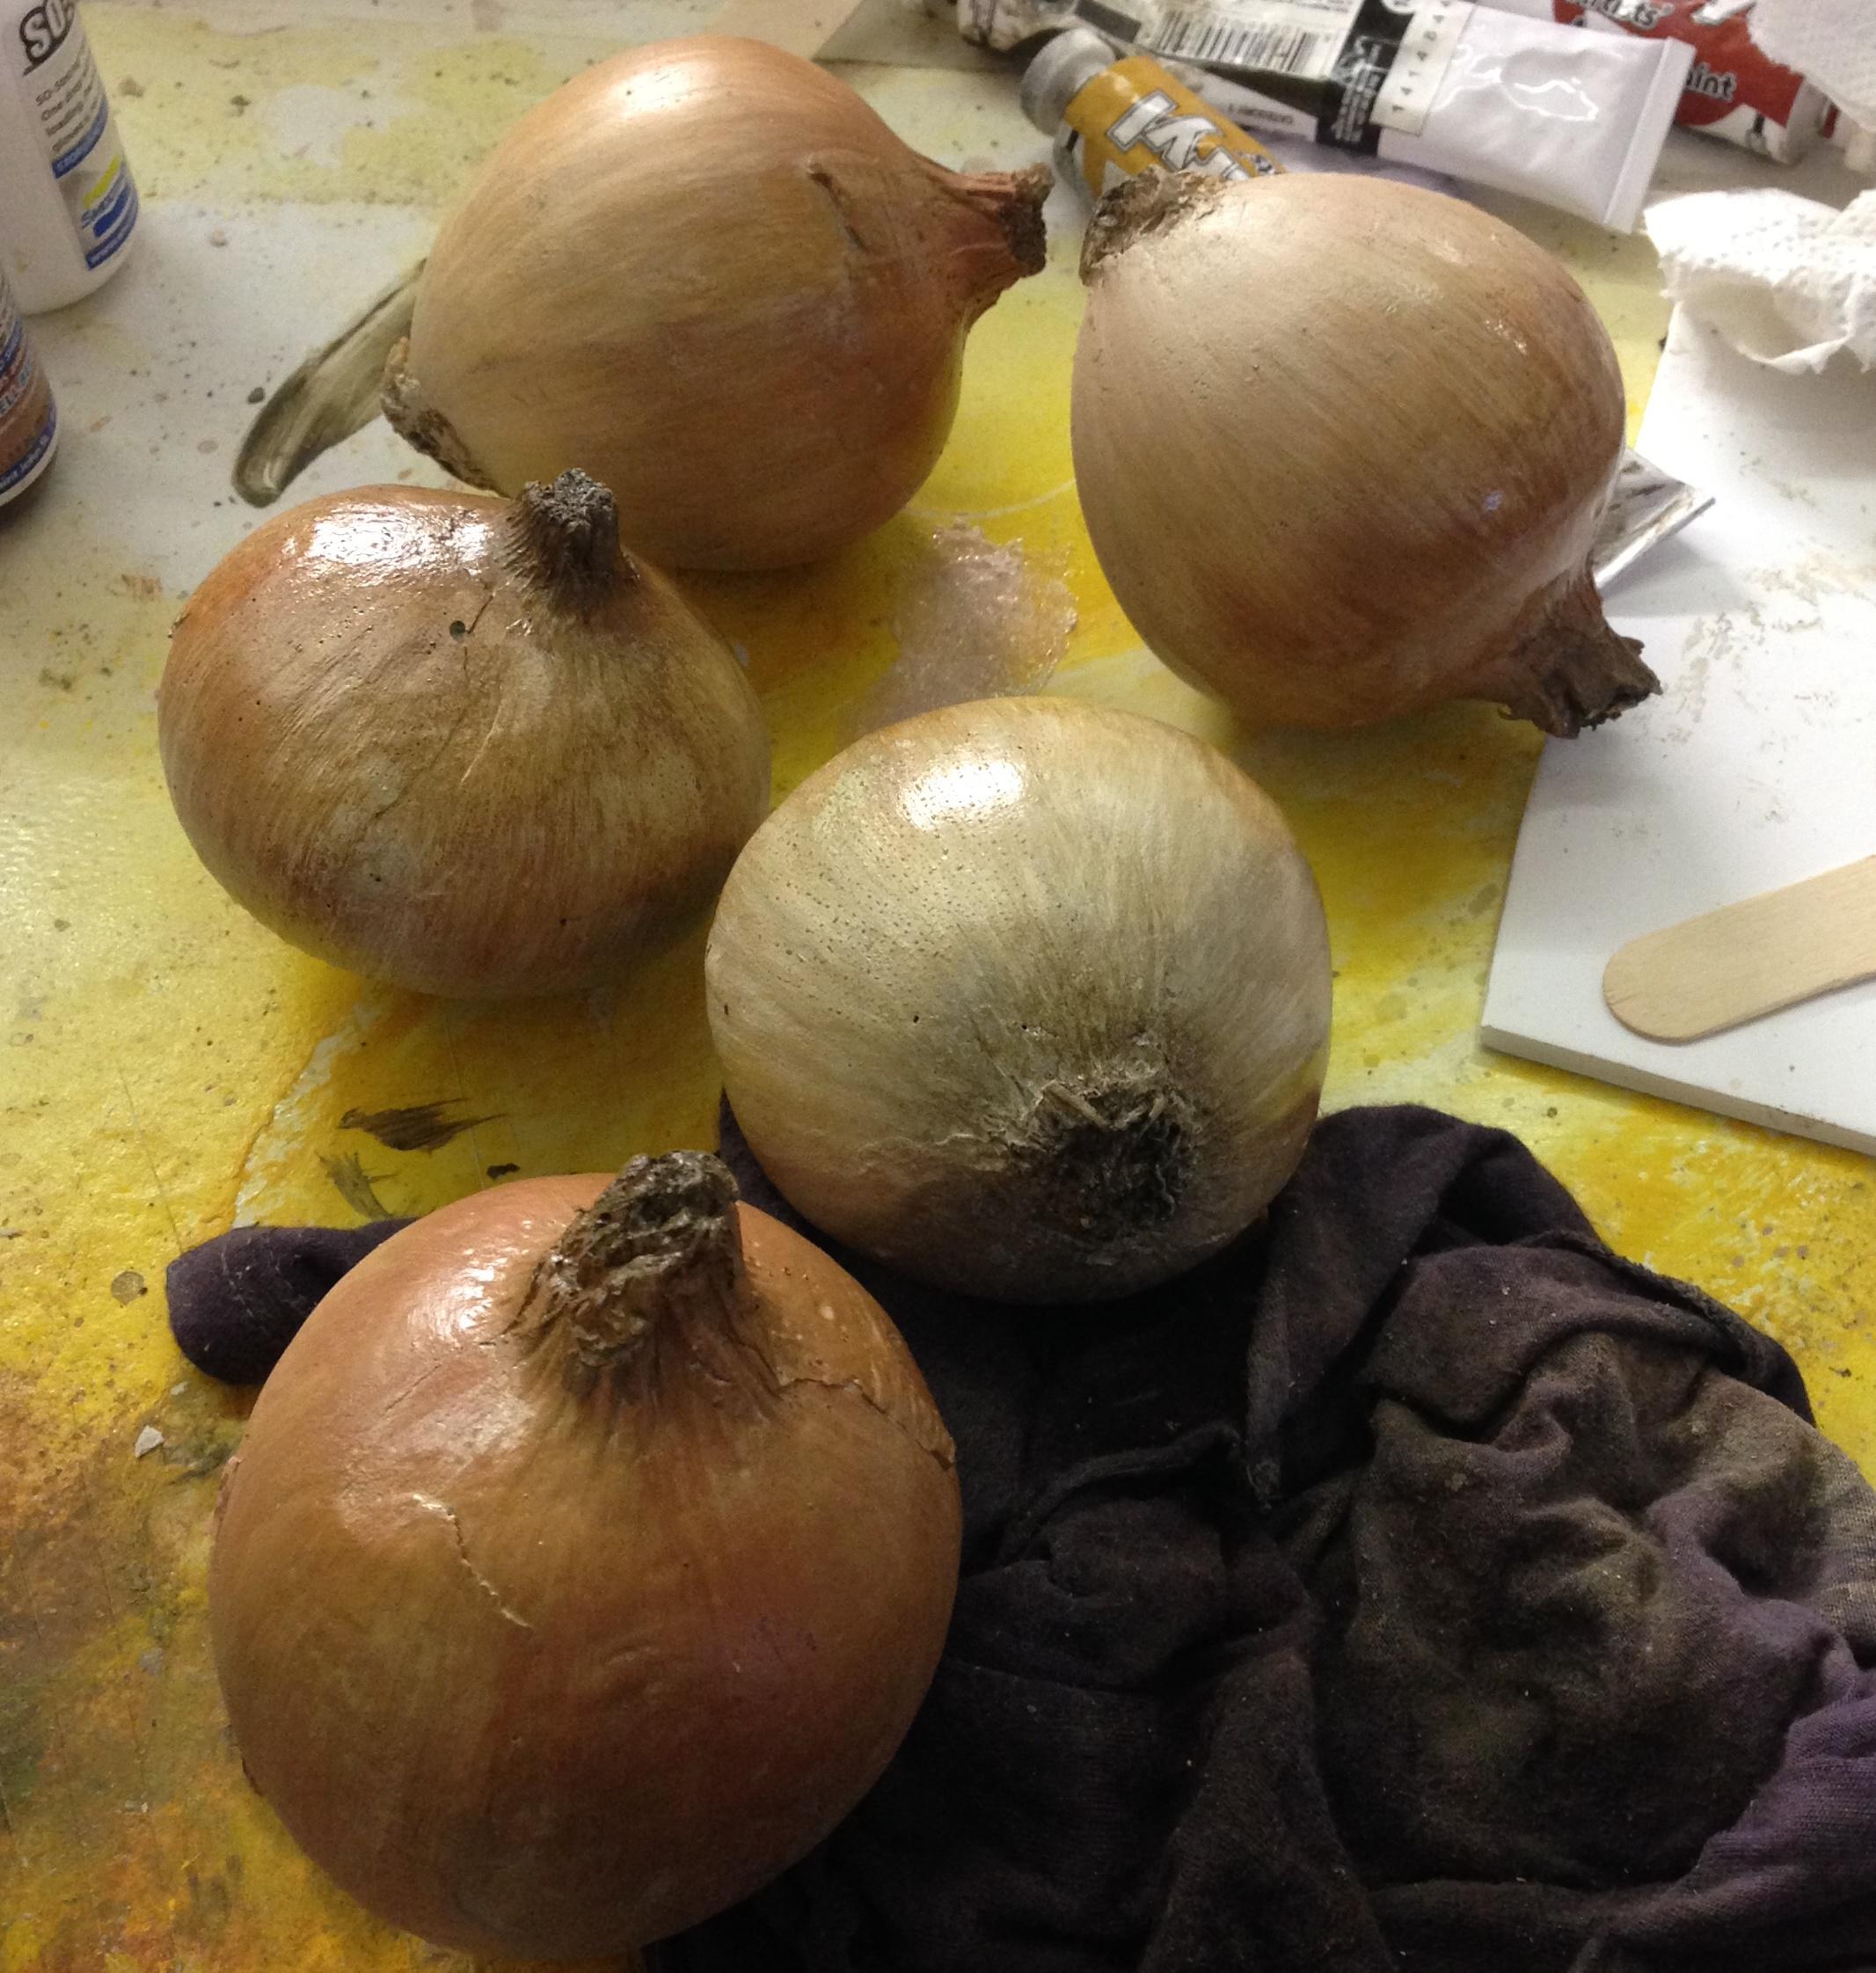 Fabricated onions